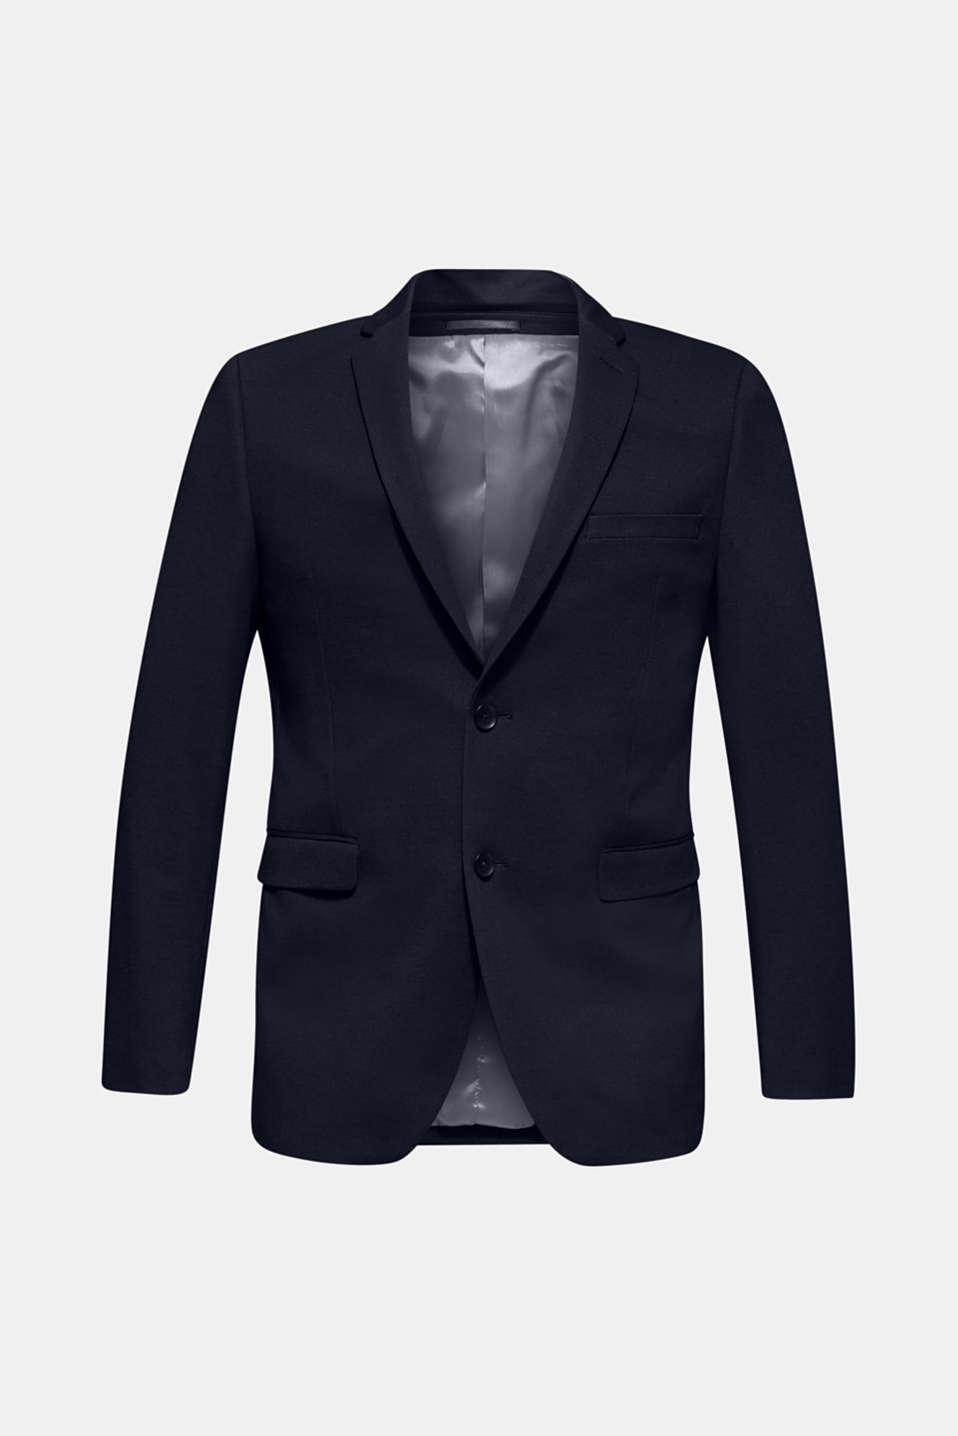 COMFORT SUIT mix + match: Textured jacket, NAVY, detail image number 7